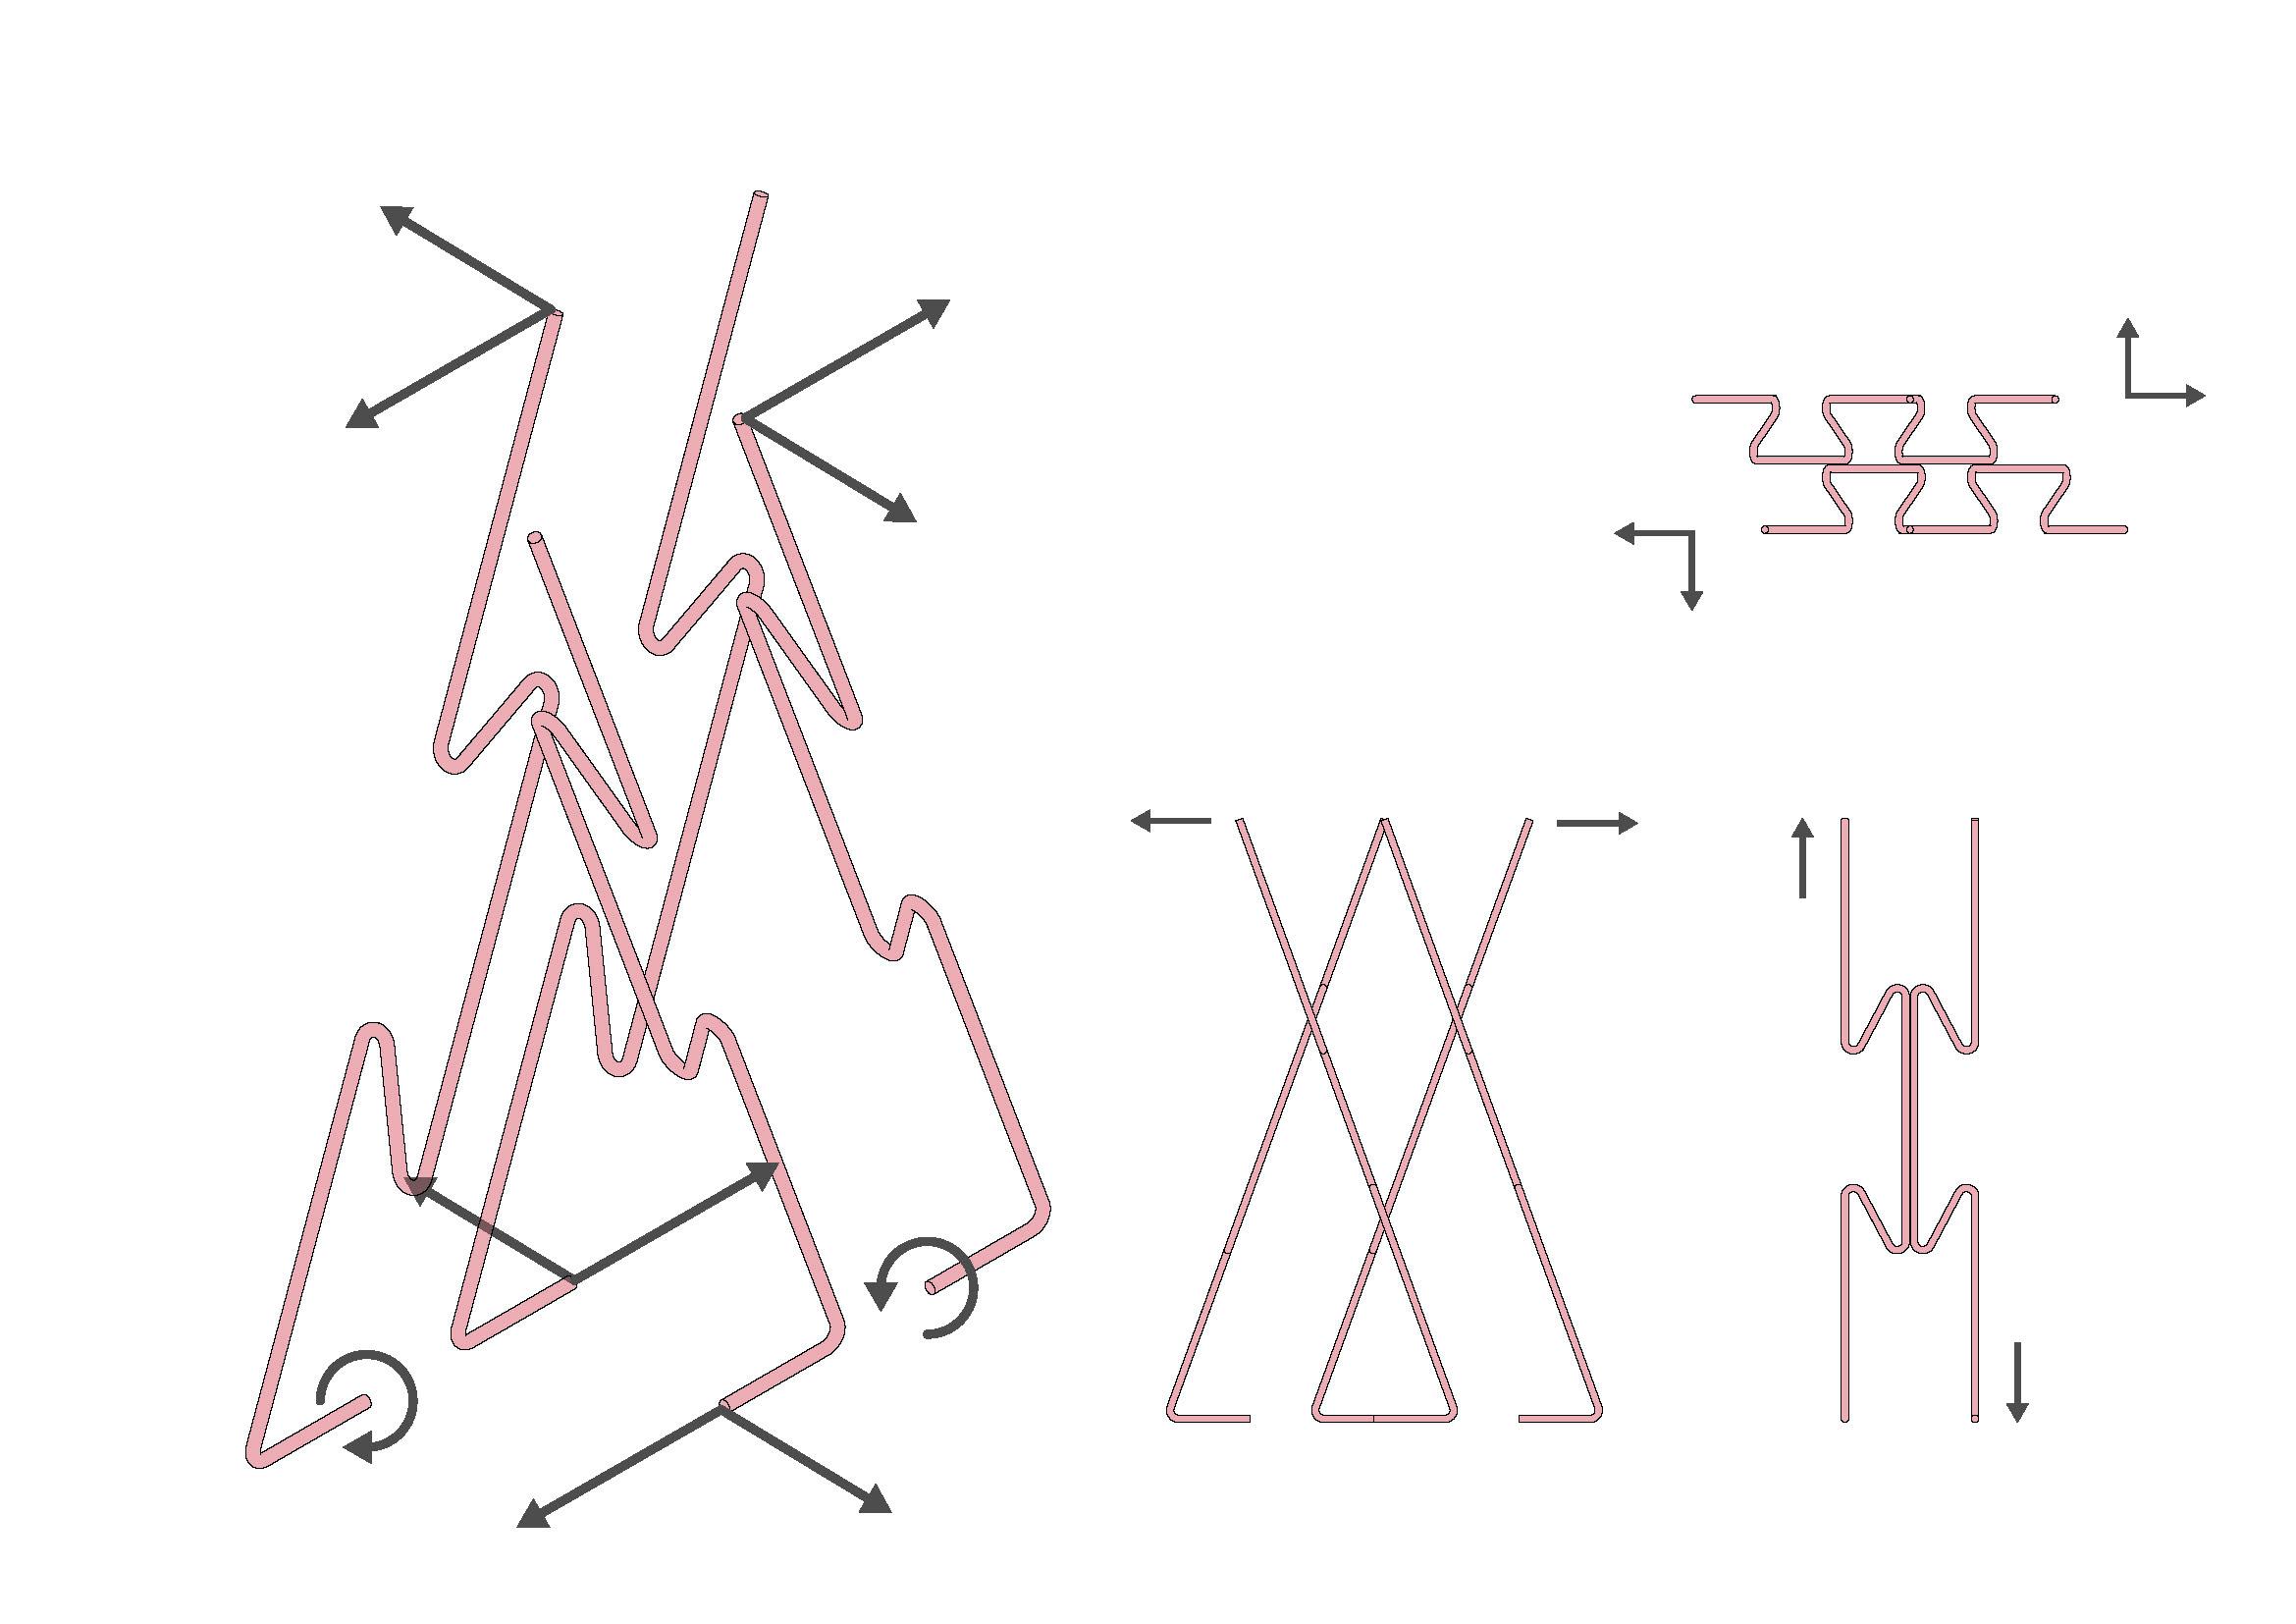 force diagram_for slides (1) 1.jpg